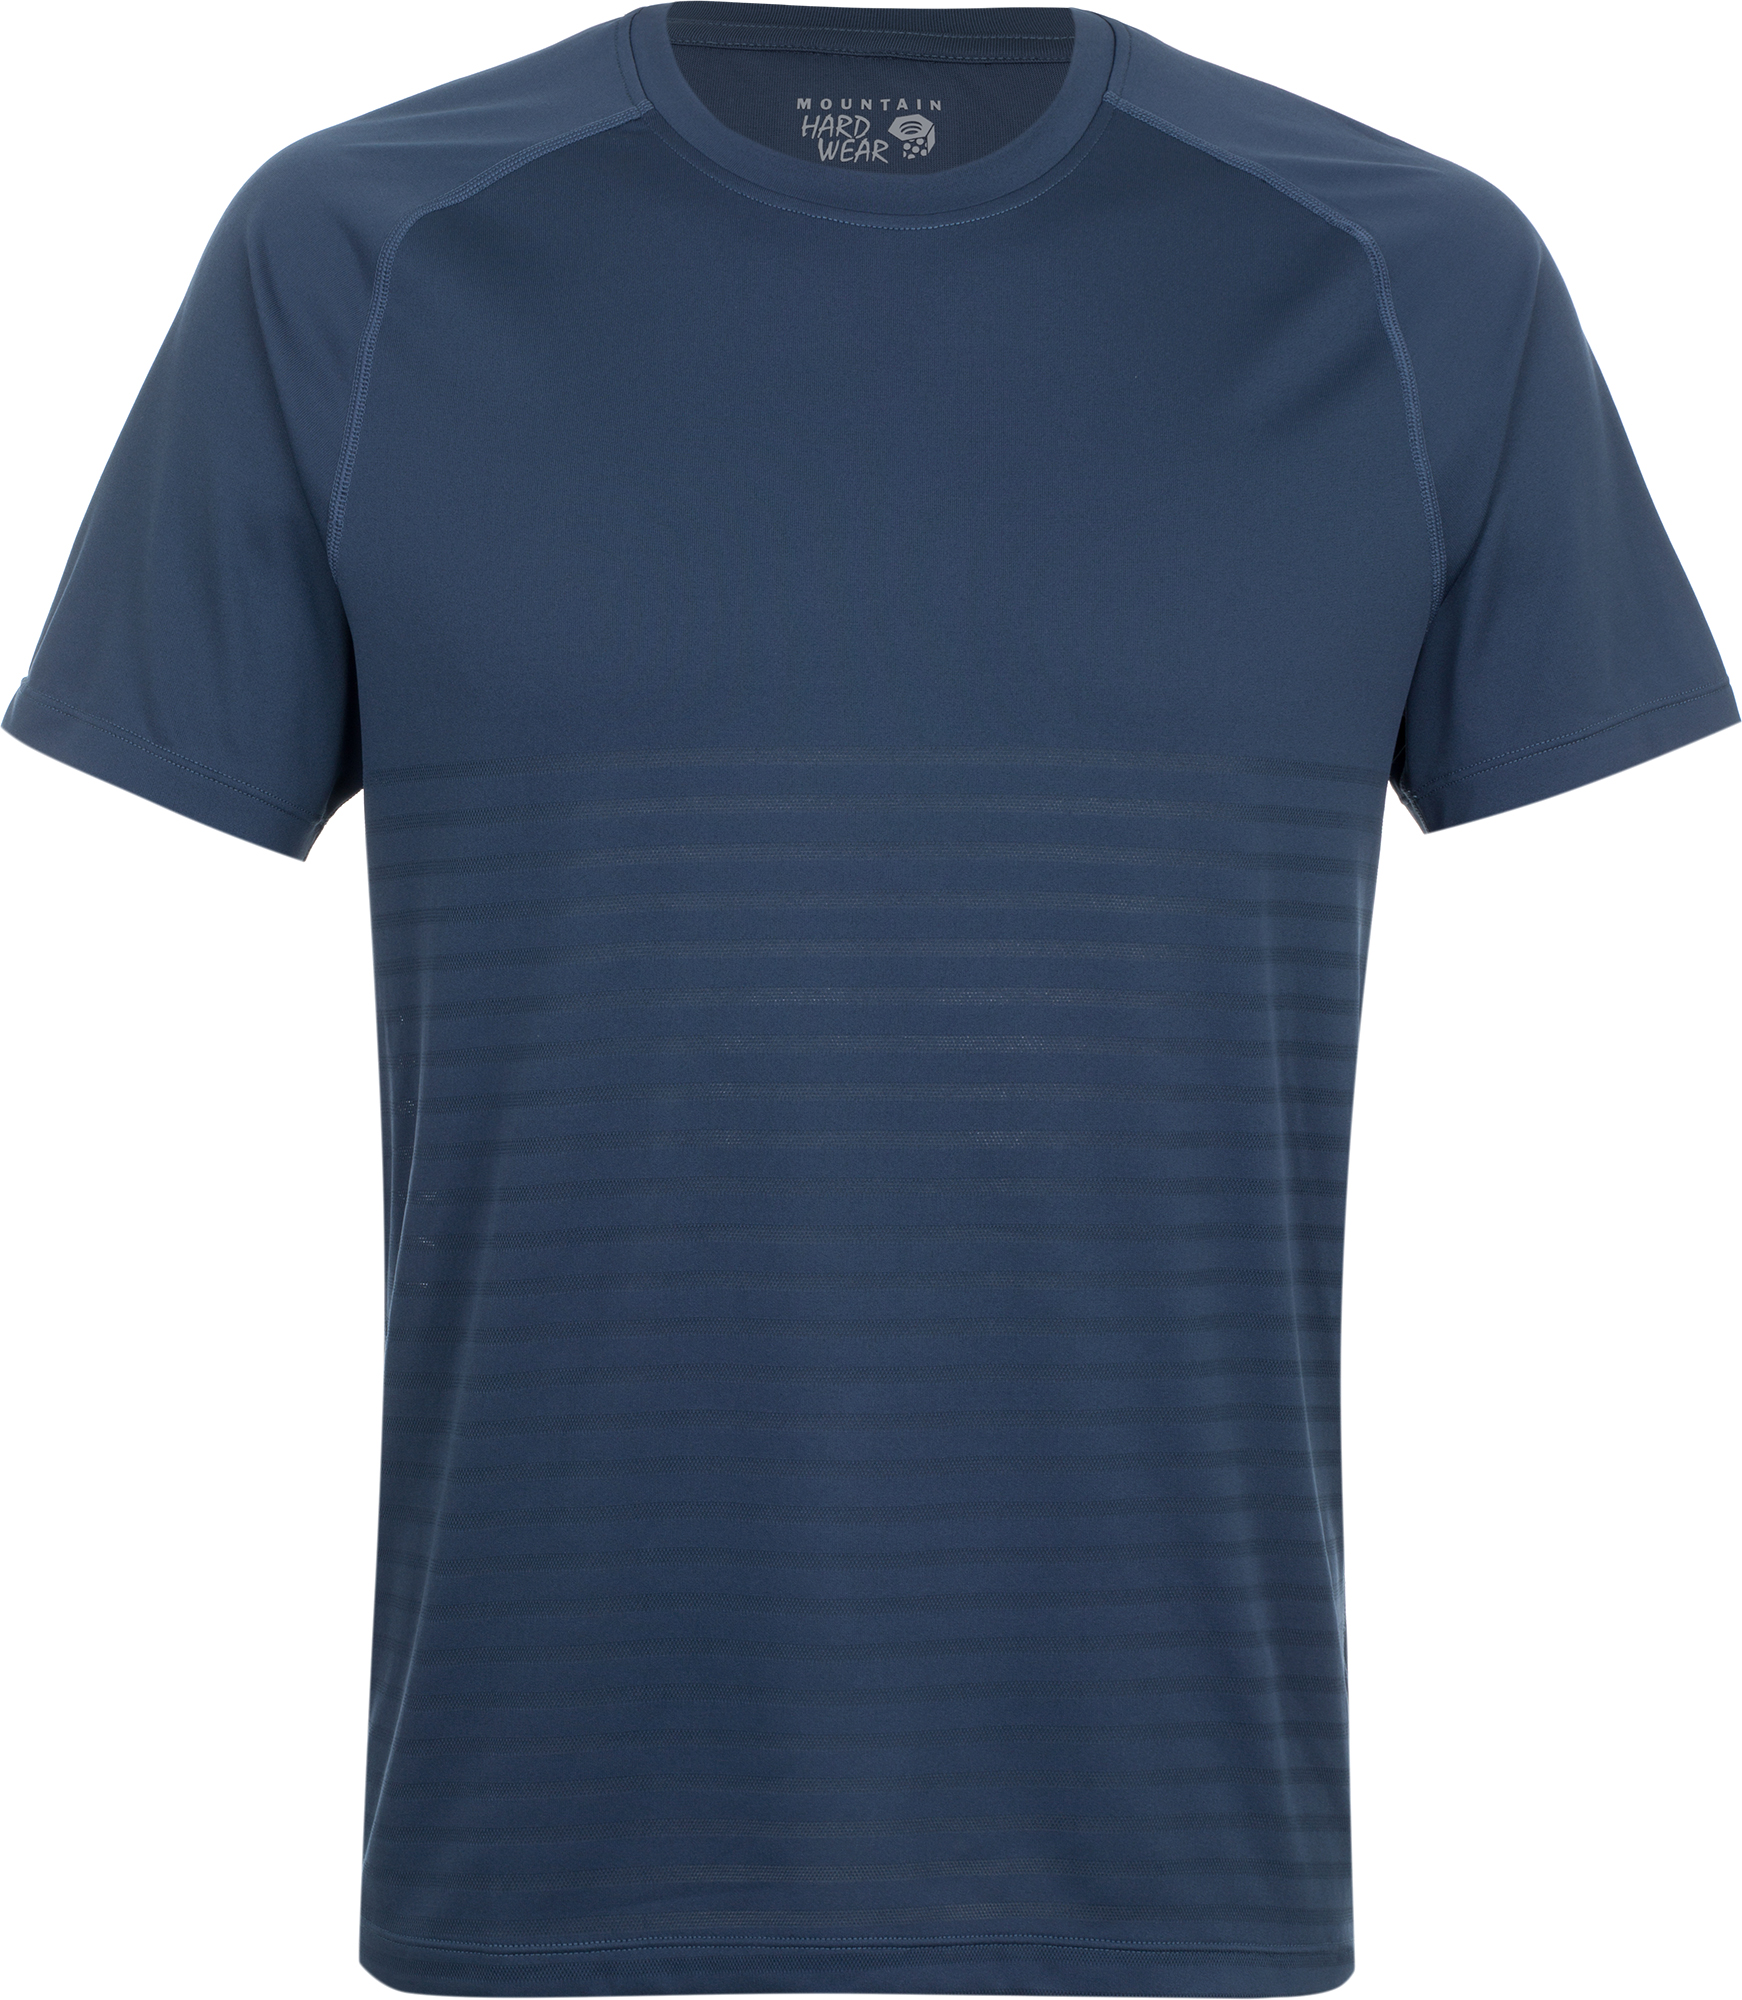 Mountain Hardwear Футболка мужская VNT, размер 50